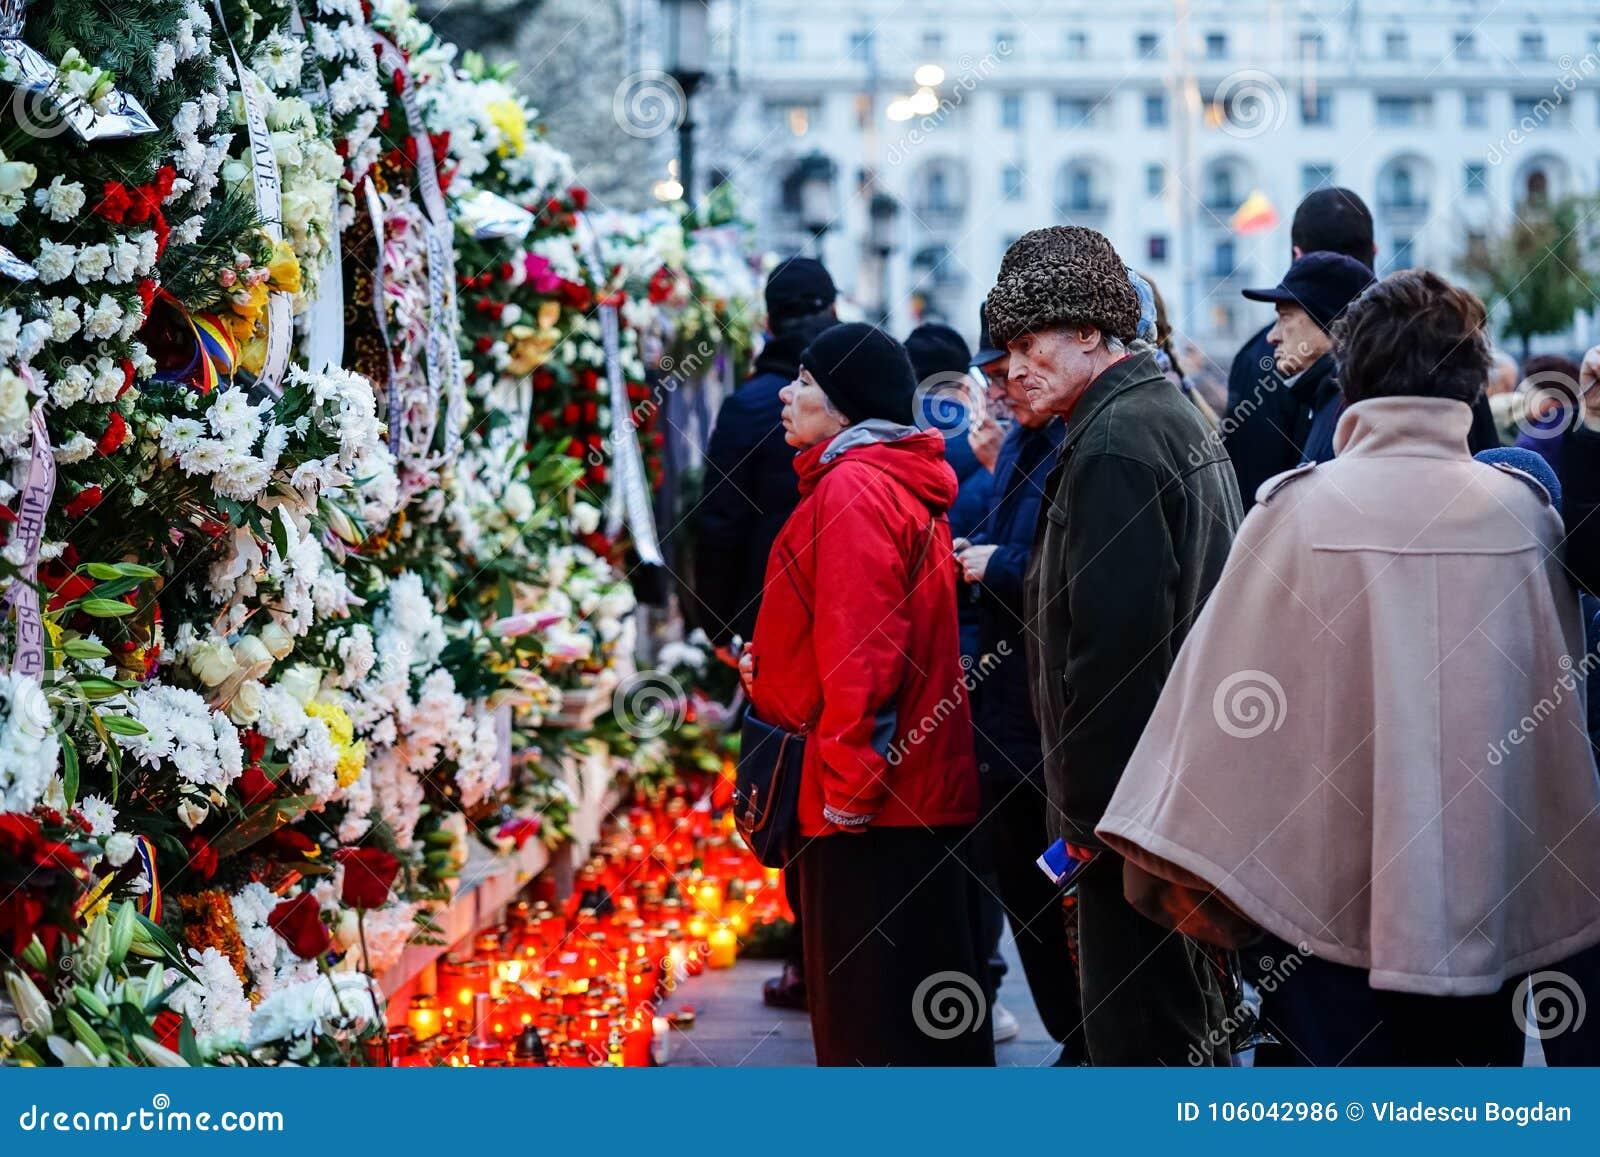 In memoriam van dood van Koning Mihai van Roemenië